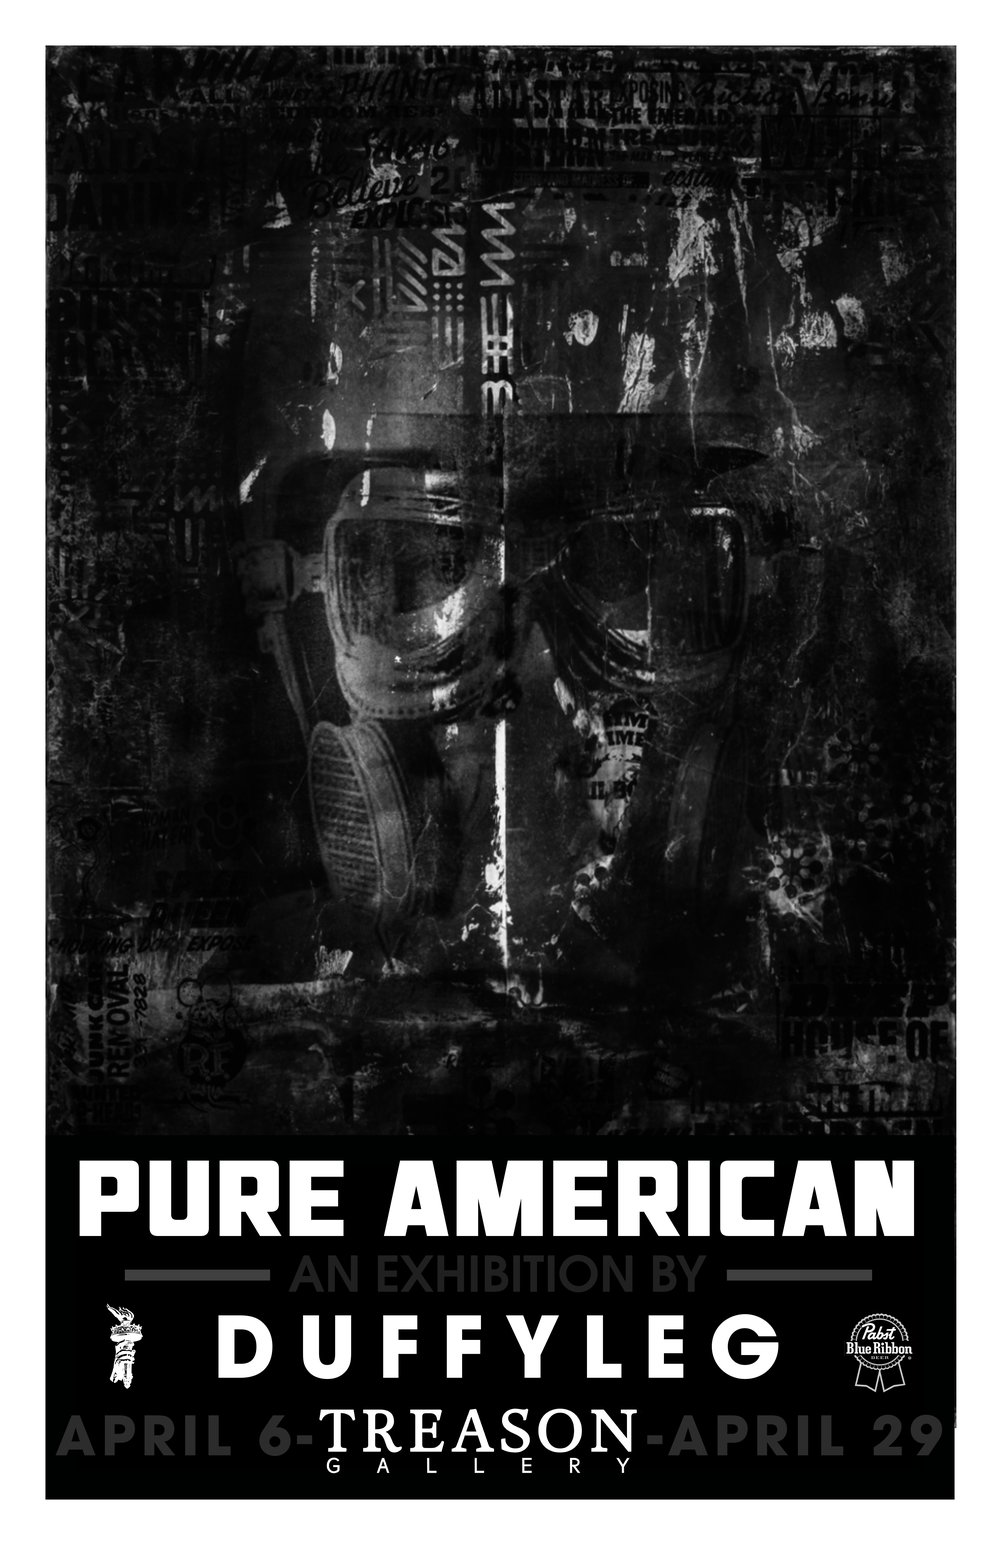 Treason Gallery_Duffyleg_Pure American_Poster.jpg